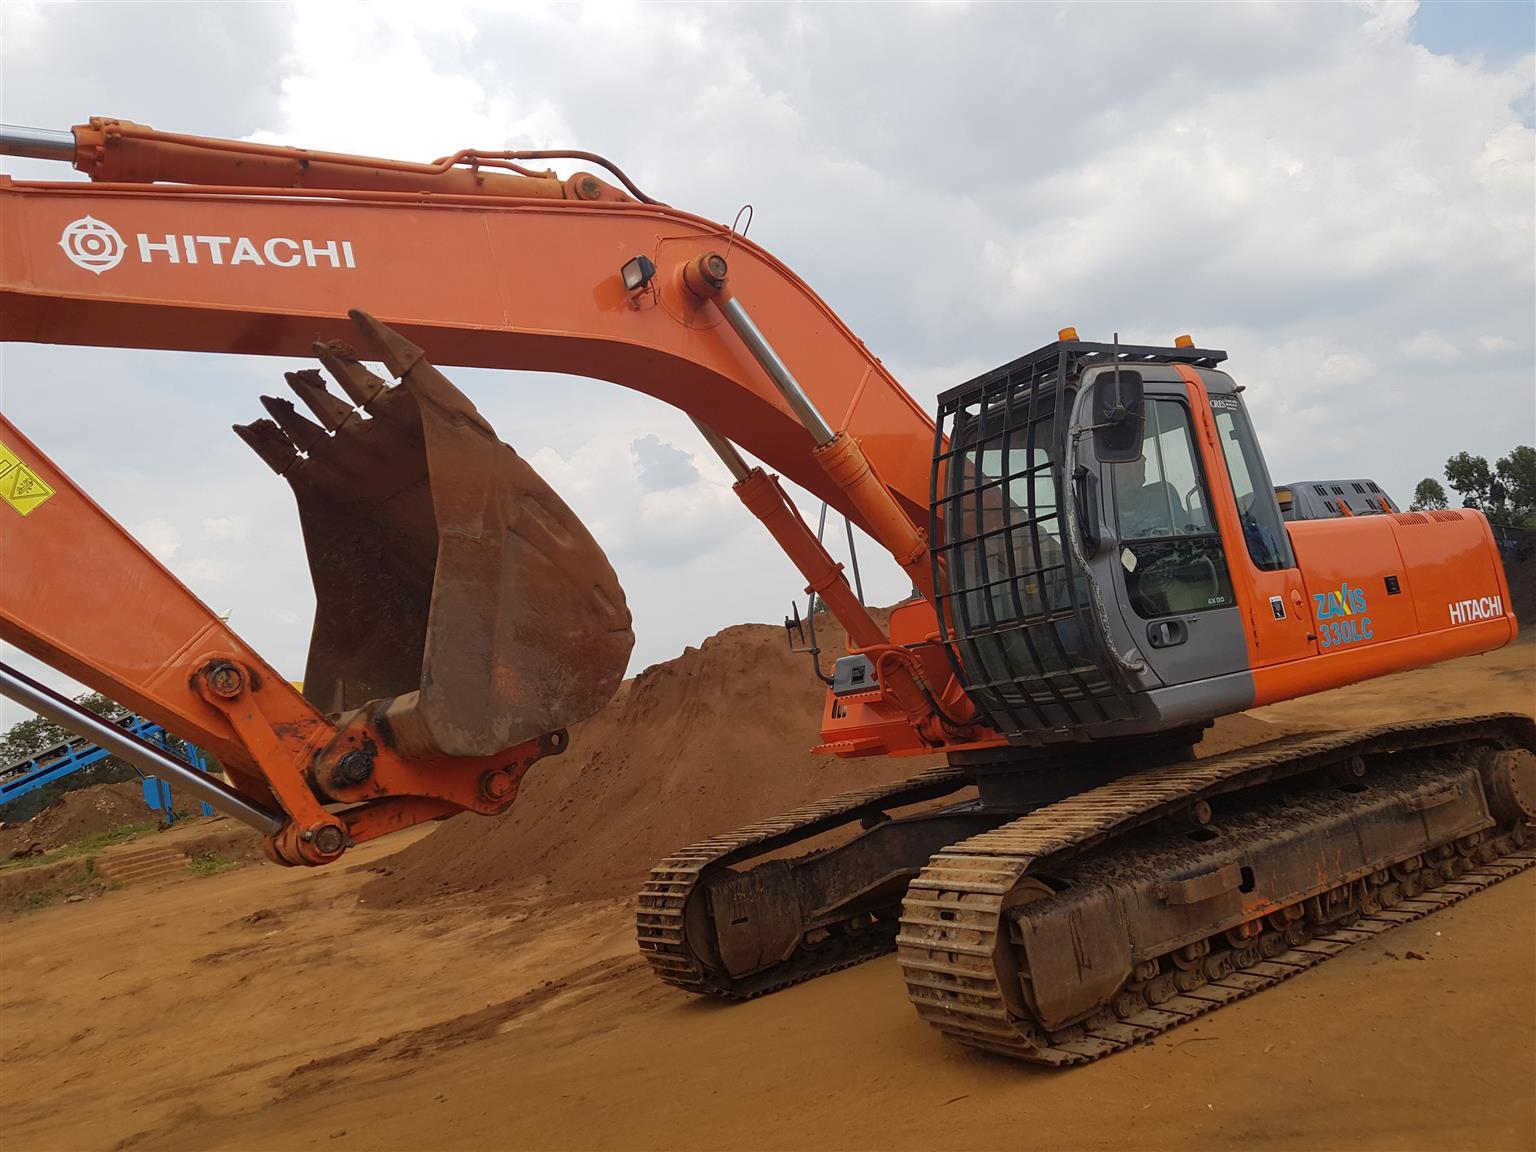 Hitachi 330 LC